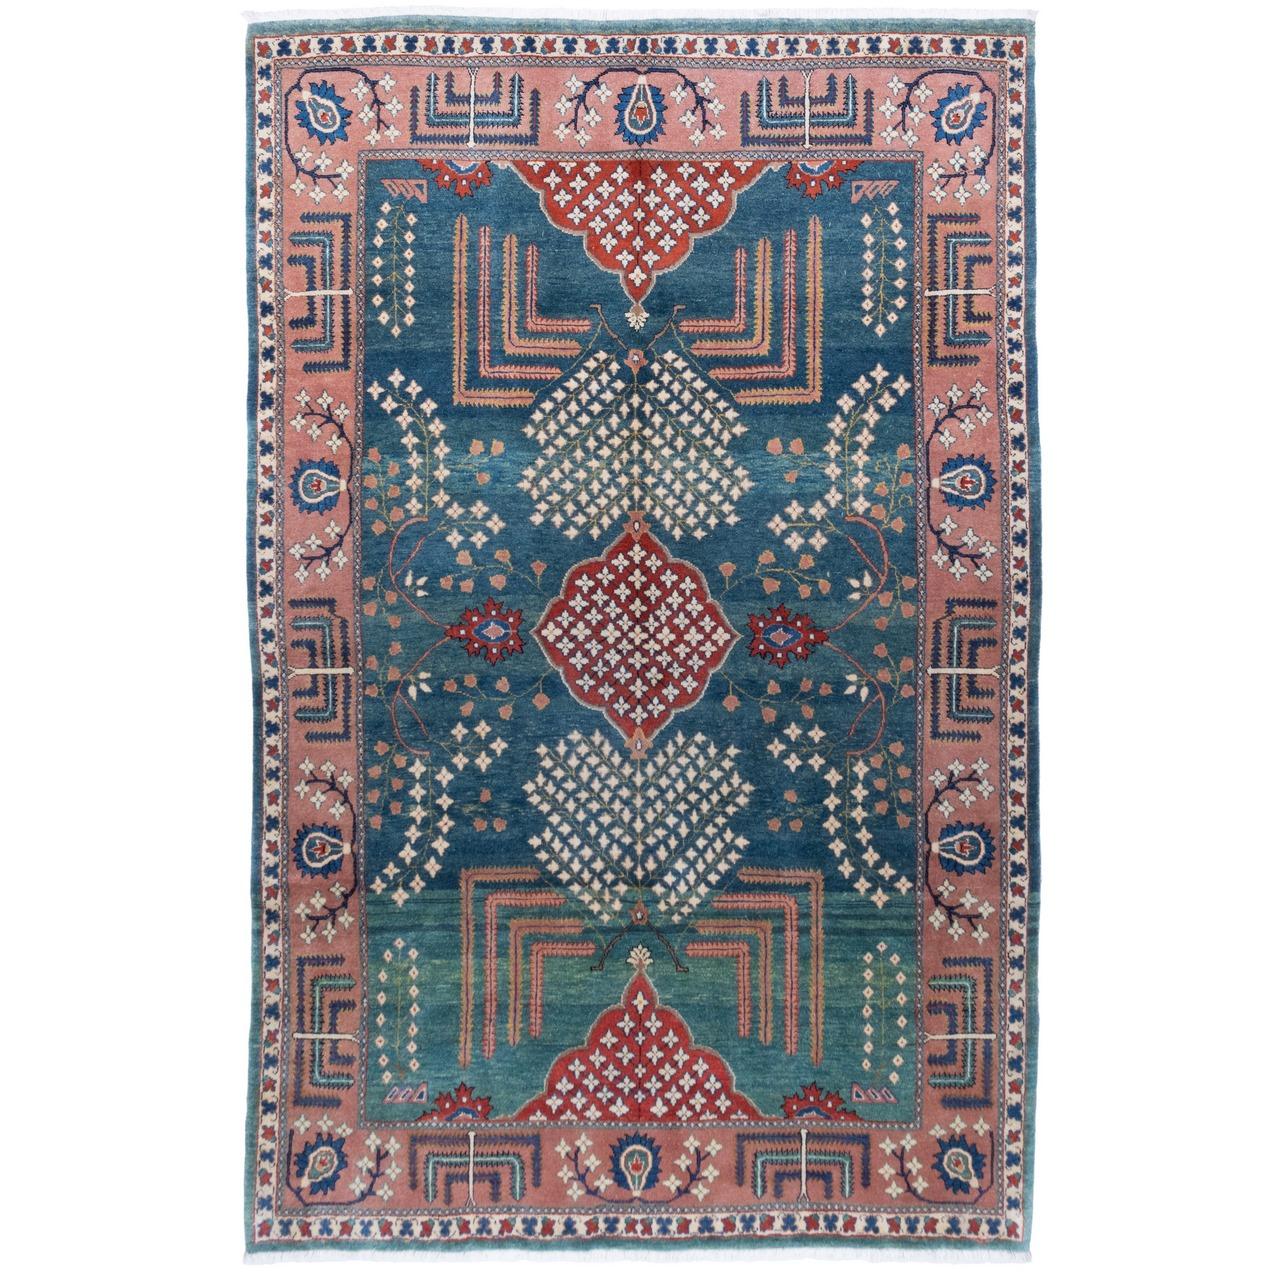 فرش دستباف شش متری سی پرشیا کد 171178